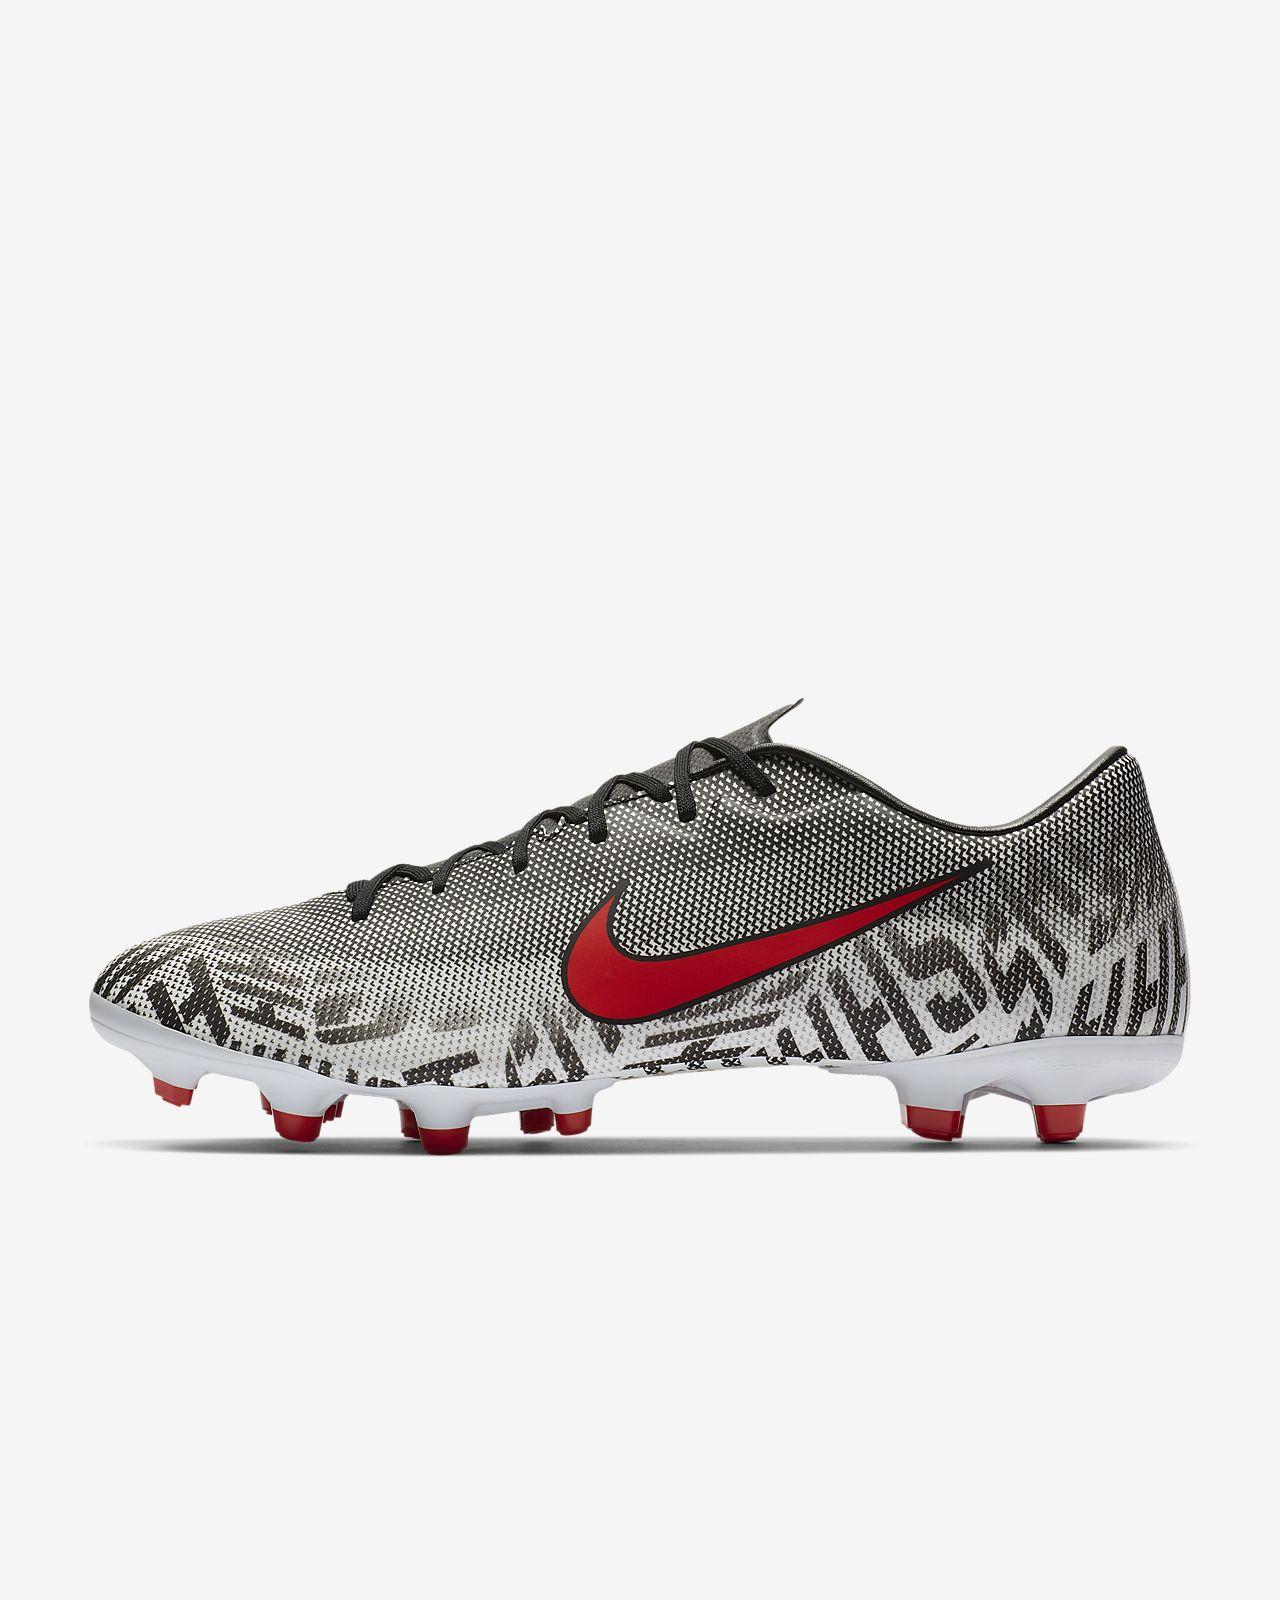 b3a184c8c86e4 ... Nike Mercurial Vapor XII Academy Neymar Botas de fútbol para múltiples  superficies